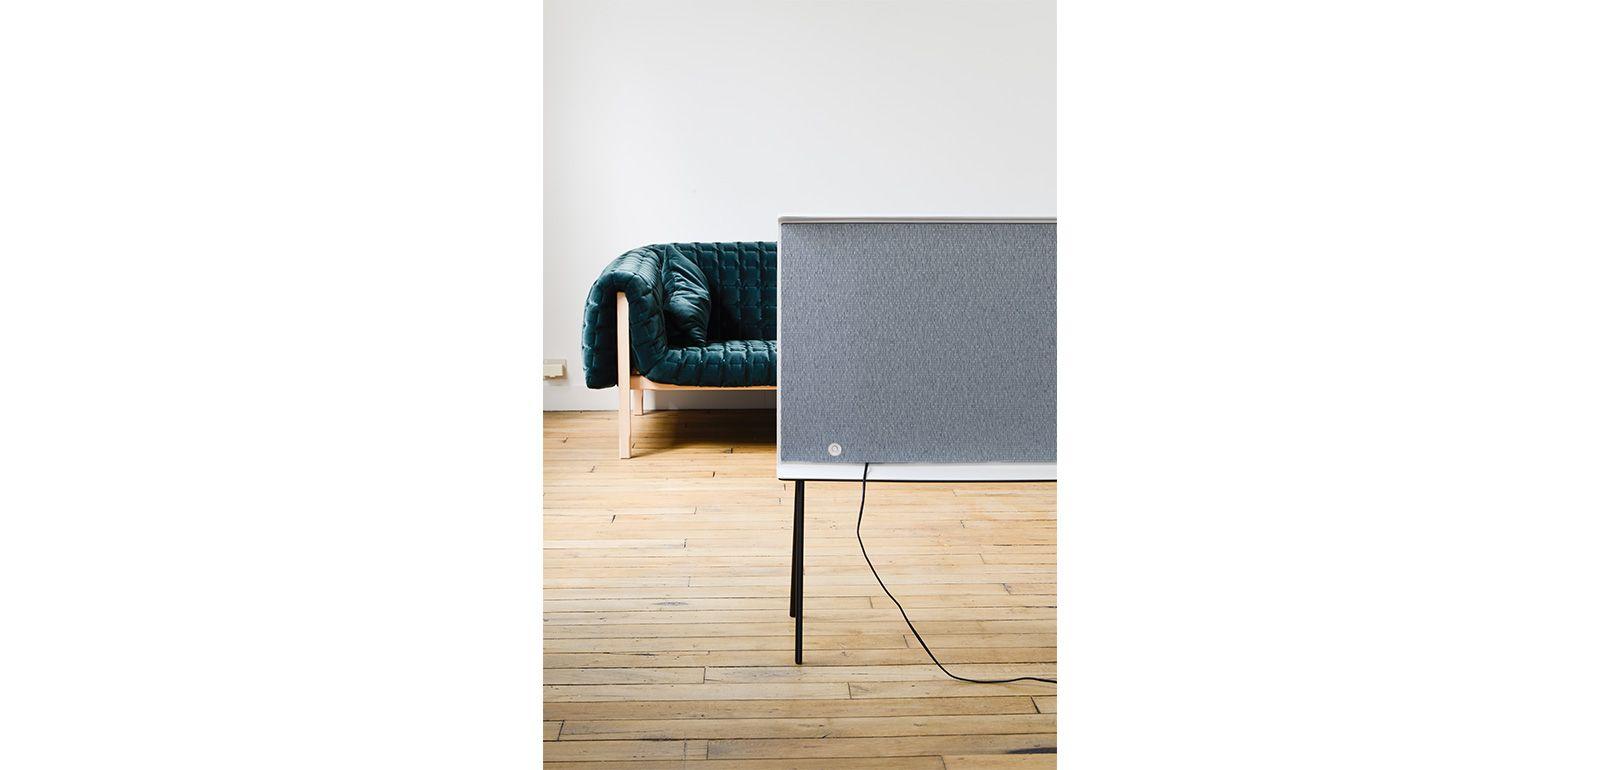 serif tv des freres bouroullec chez silvera wagram silvera. Black Bedroom Furniture Sets. Home Design Ideas